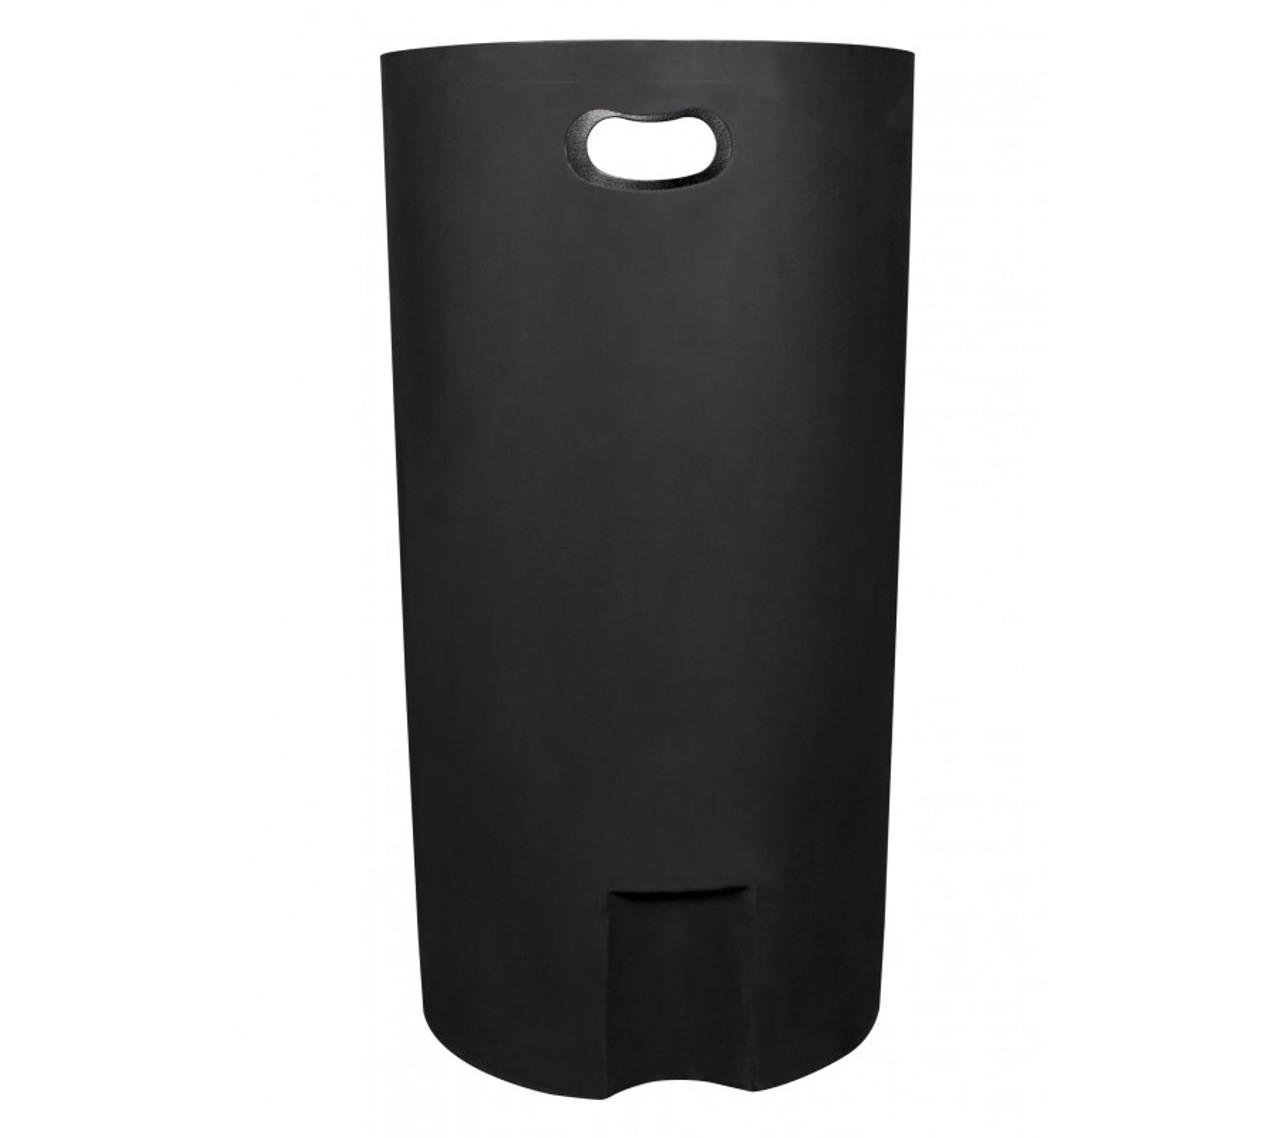 33 Gallon Plastic Liner 99-126PL-FG for VCT-33 Trash Cans